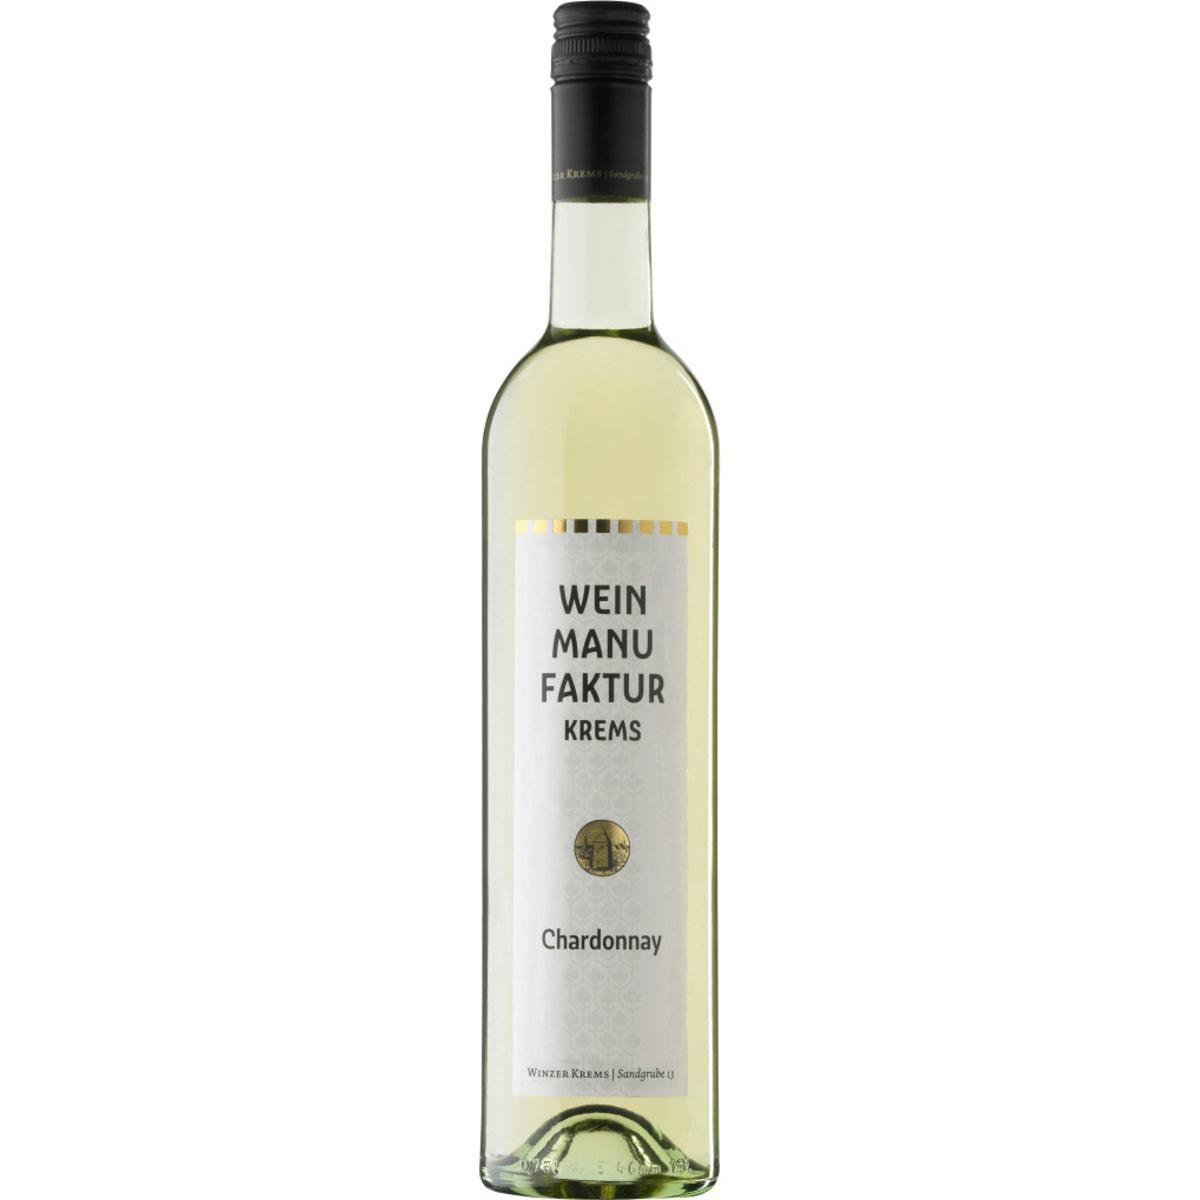 WK Weinmanufaktur Chardonnay